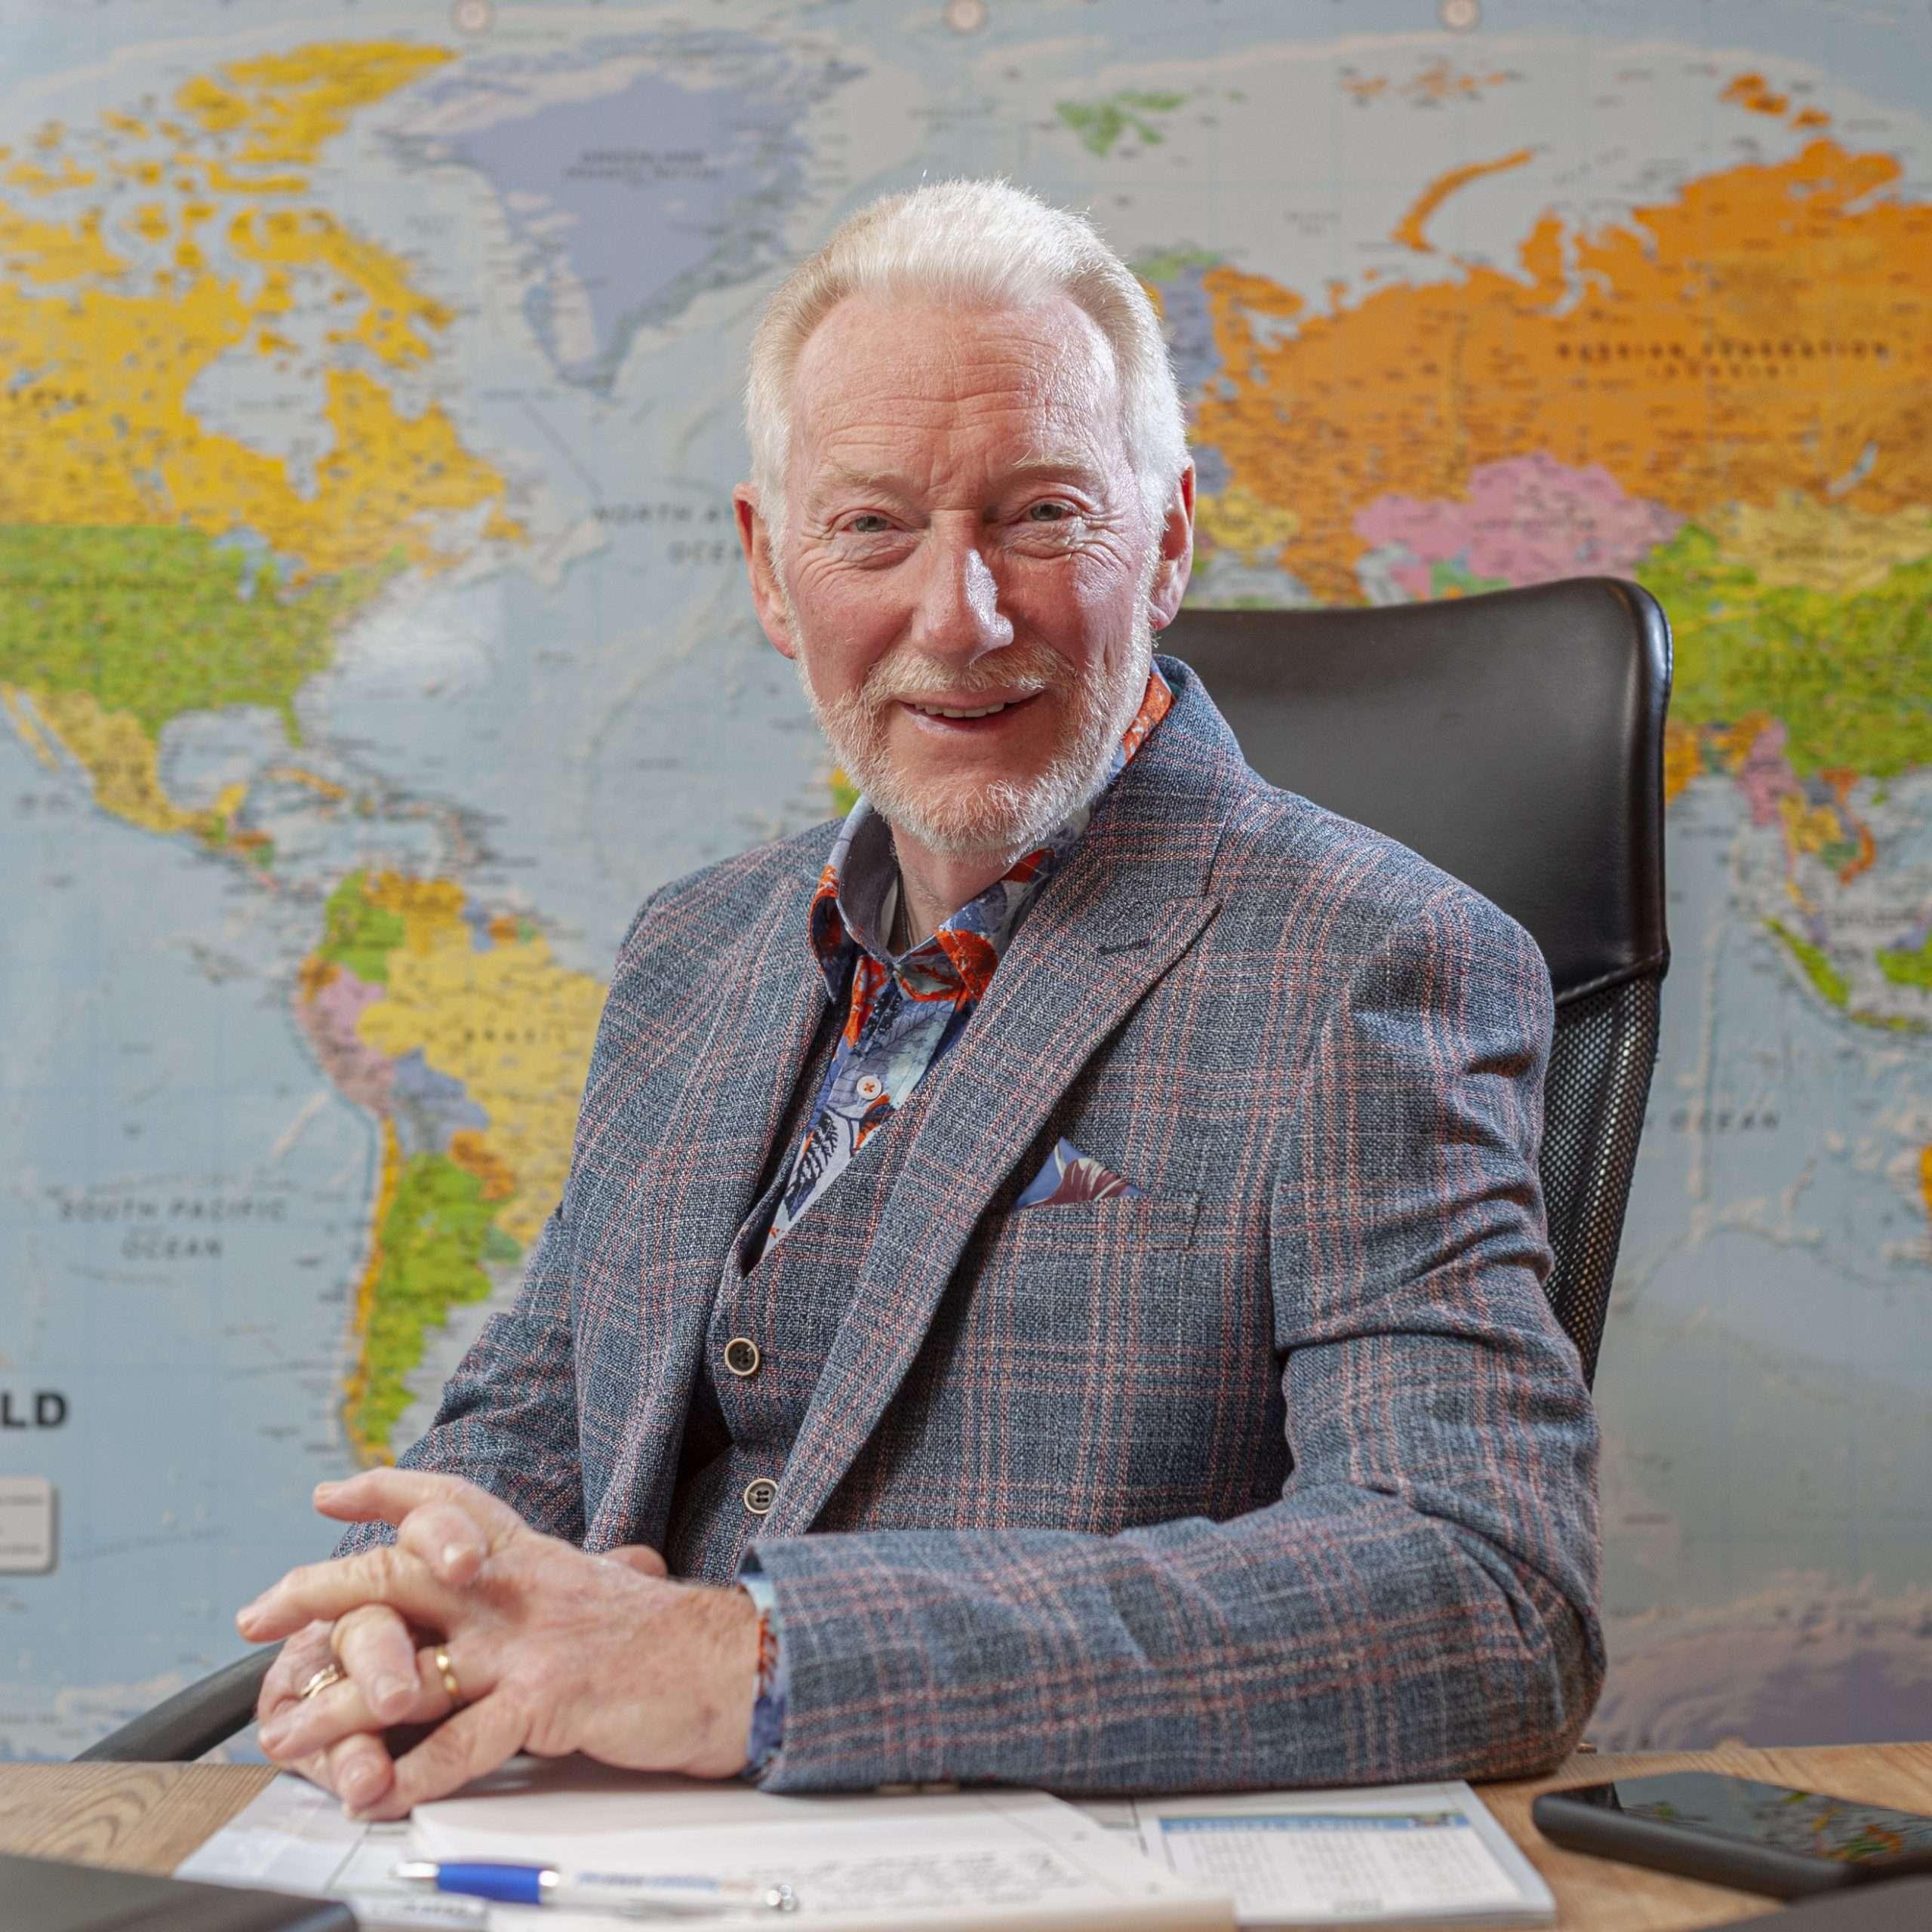 Terry Cooper at Expo Scotland